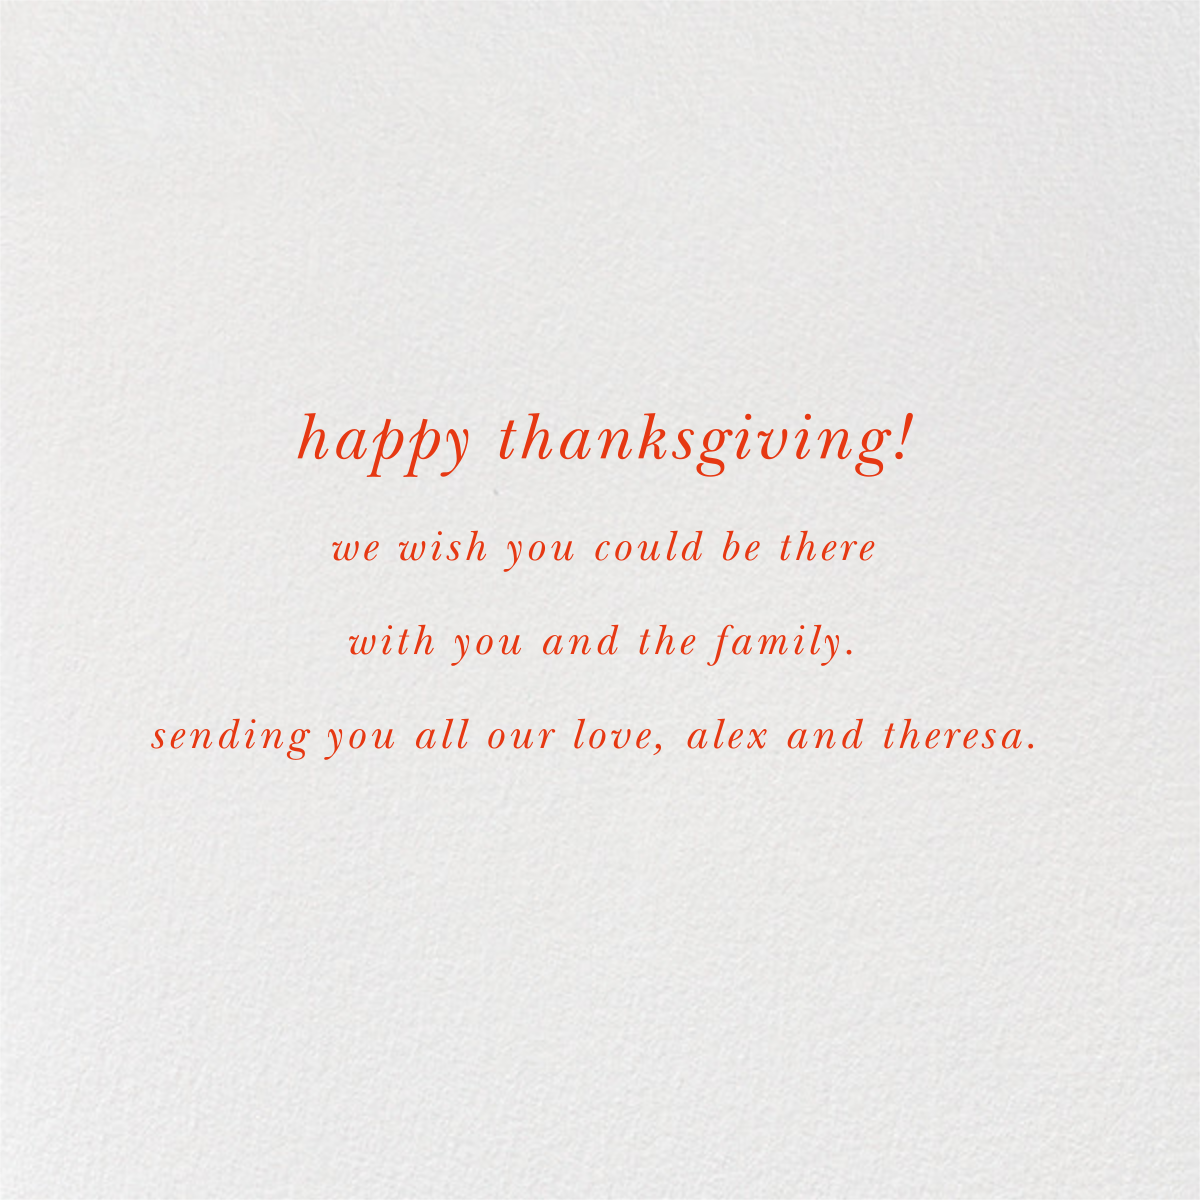 Good Food Good Mood - kate spade new york - Thanksgiving - card back